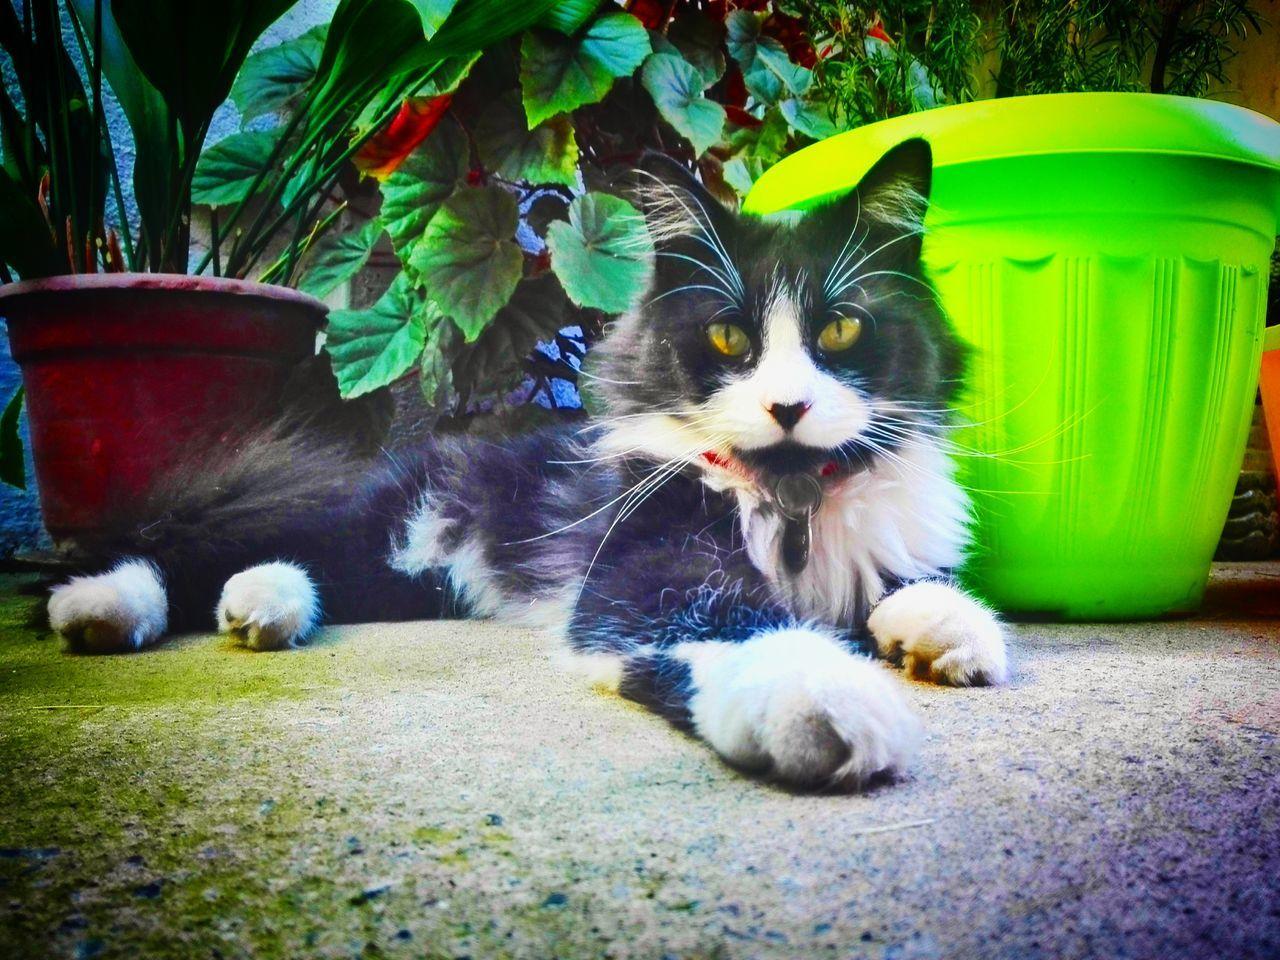 🍀Romeo 🌿 Romeo 🌿 Pets One Animal Domestic Cat Domestic Animals Feline Day Animal Themes Nature Garden Green Cats 🐱 ınstagram Black White Cateyes Yellow Colors